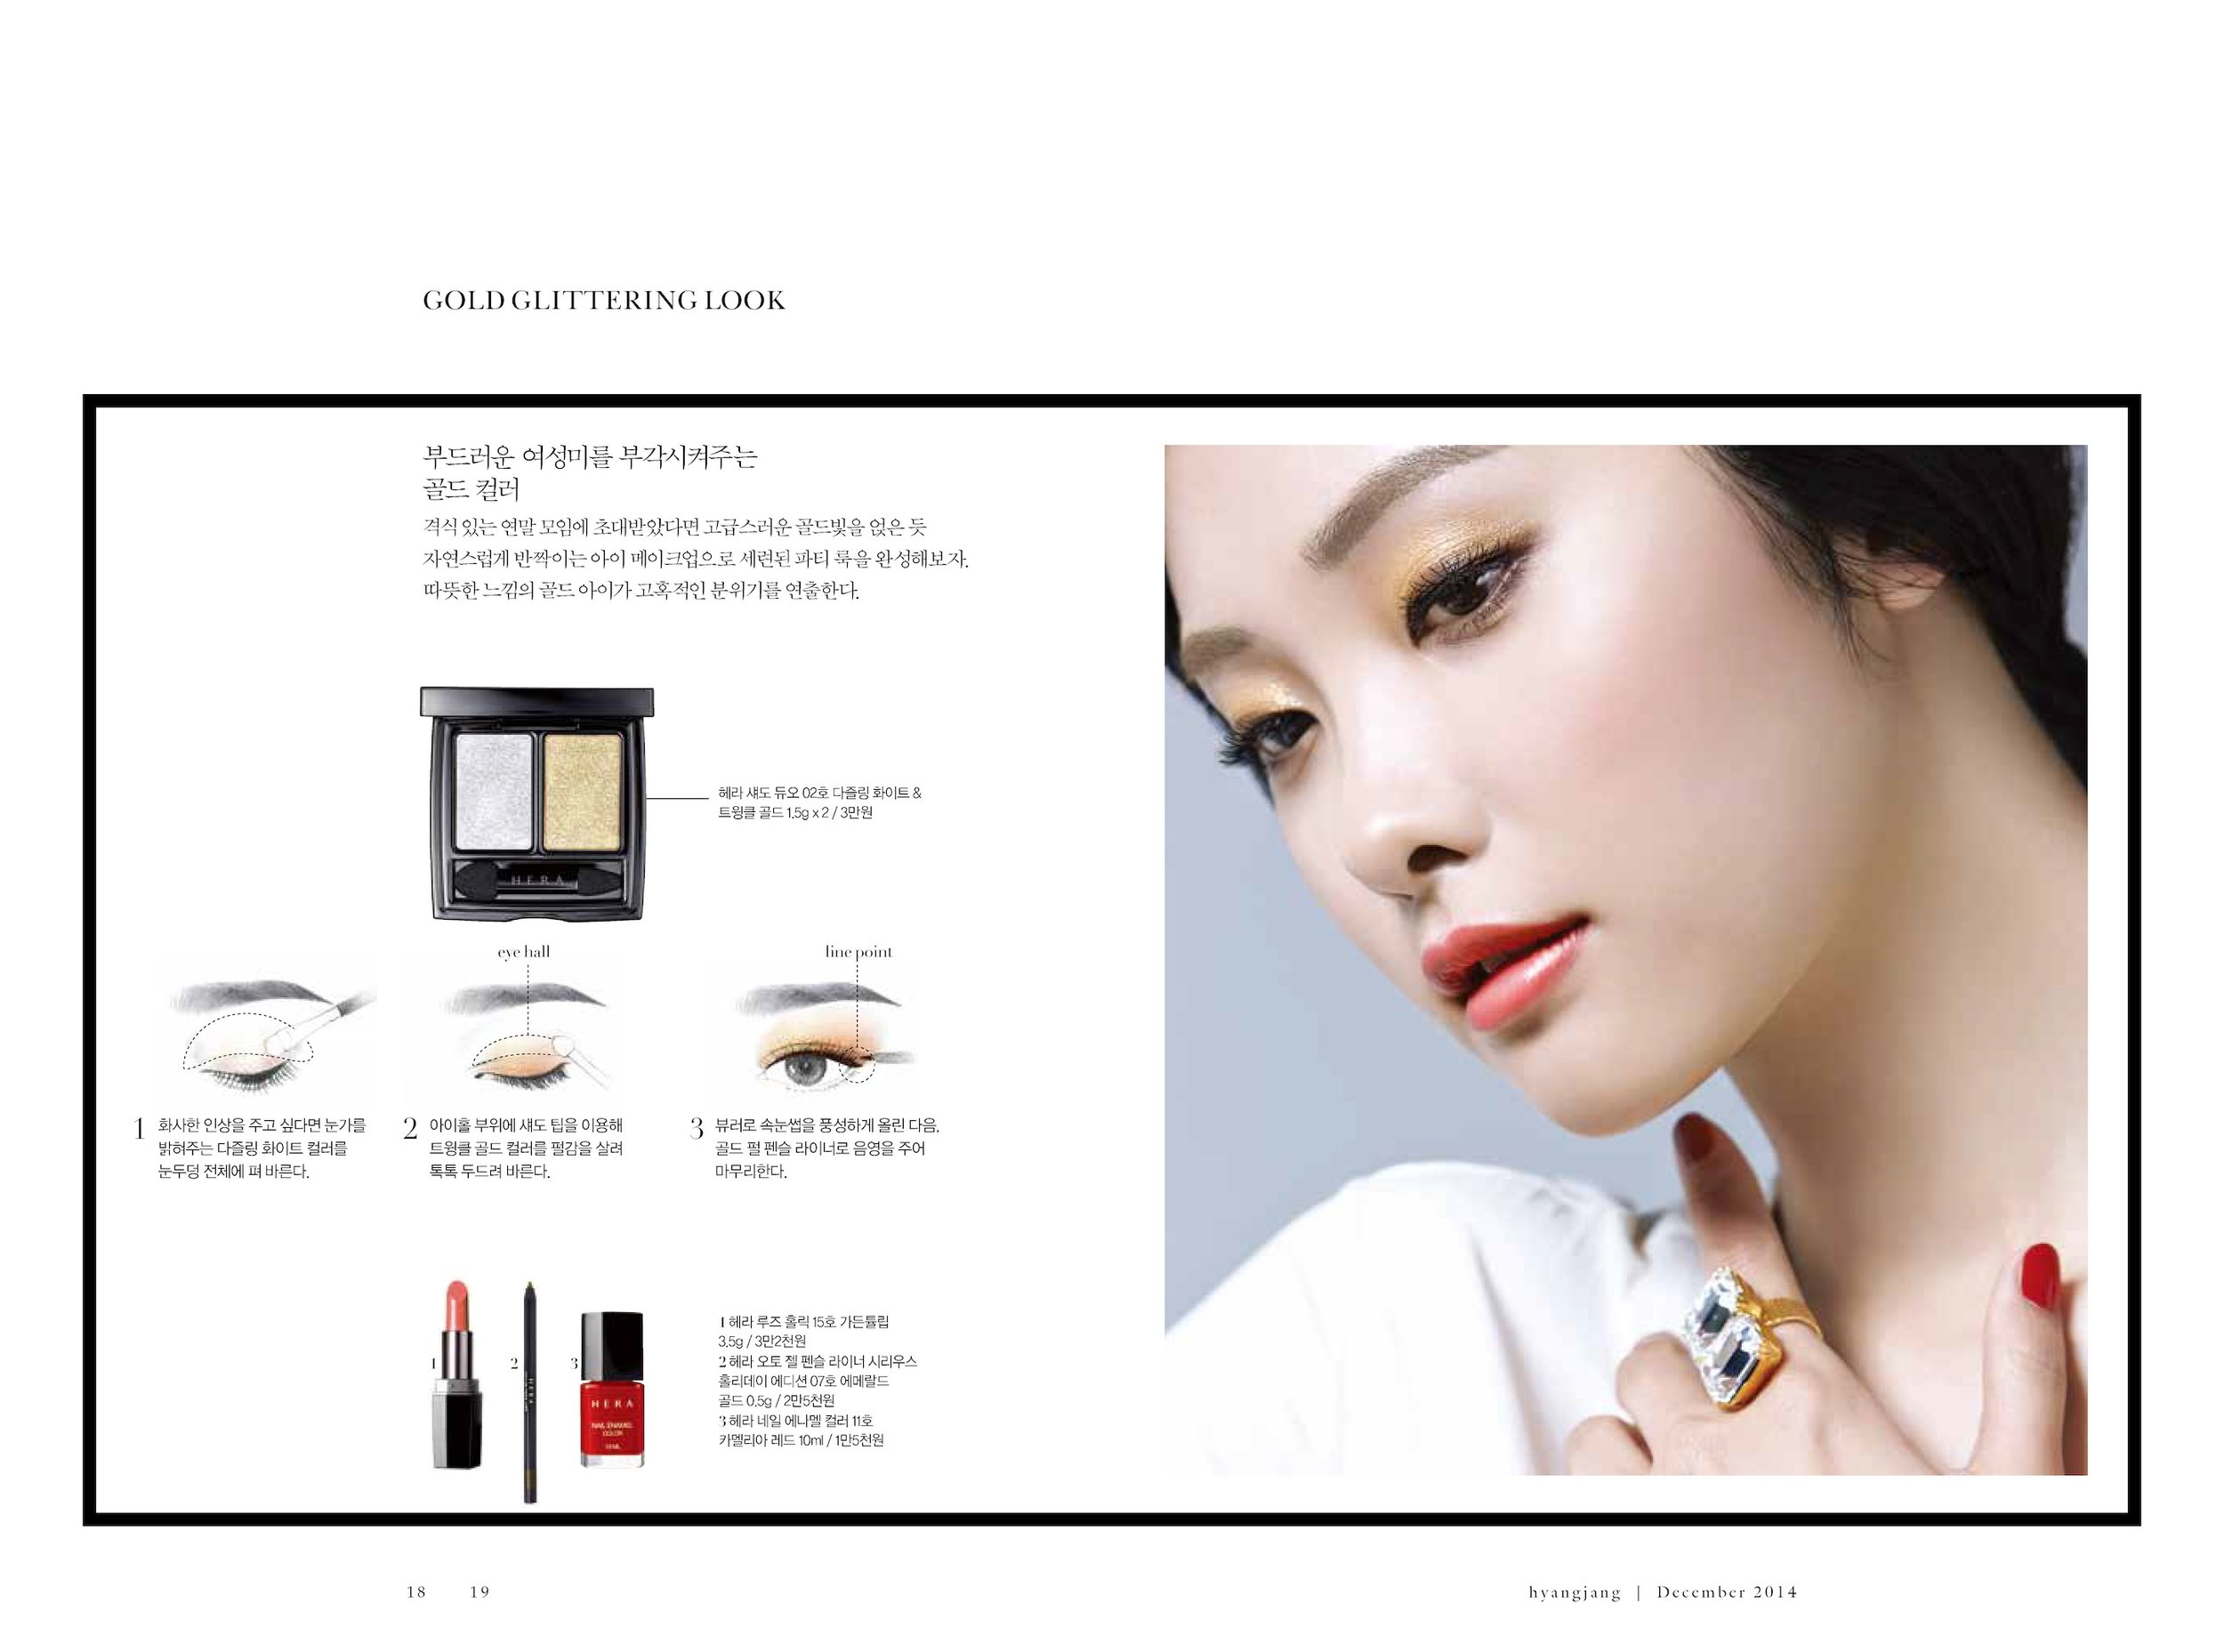 hyangjang-201412_페이지_11.jpeg